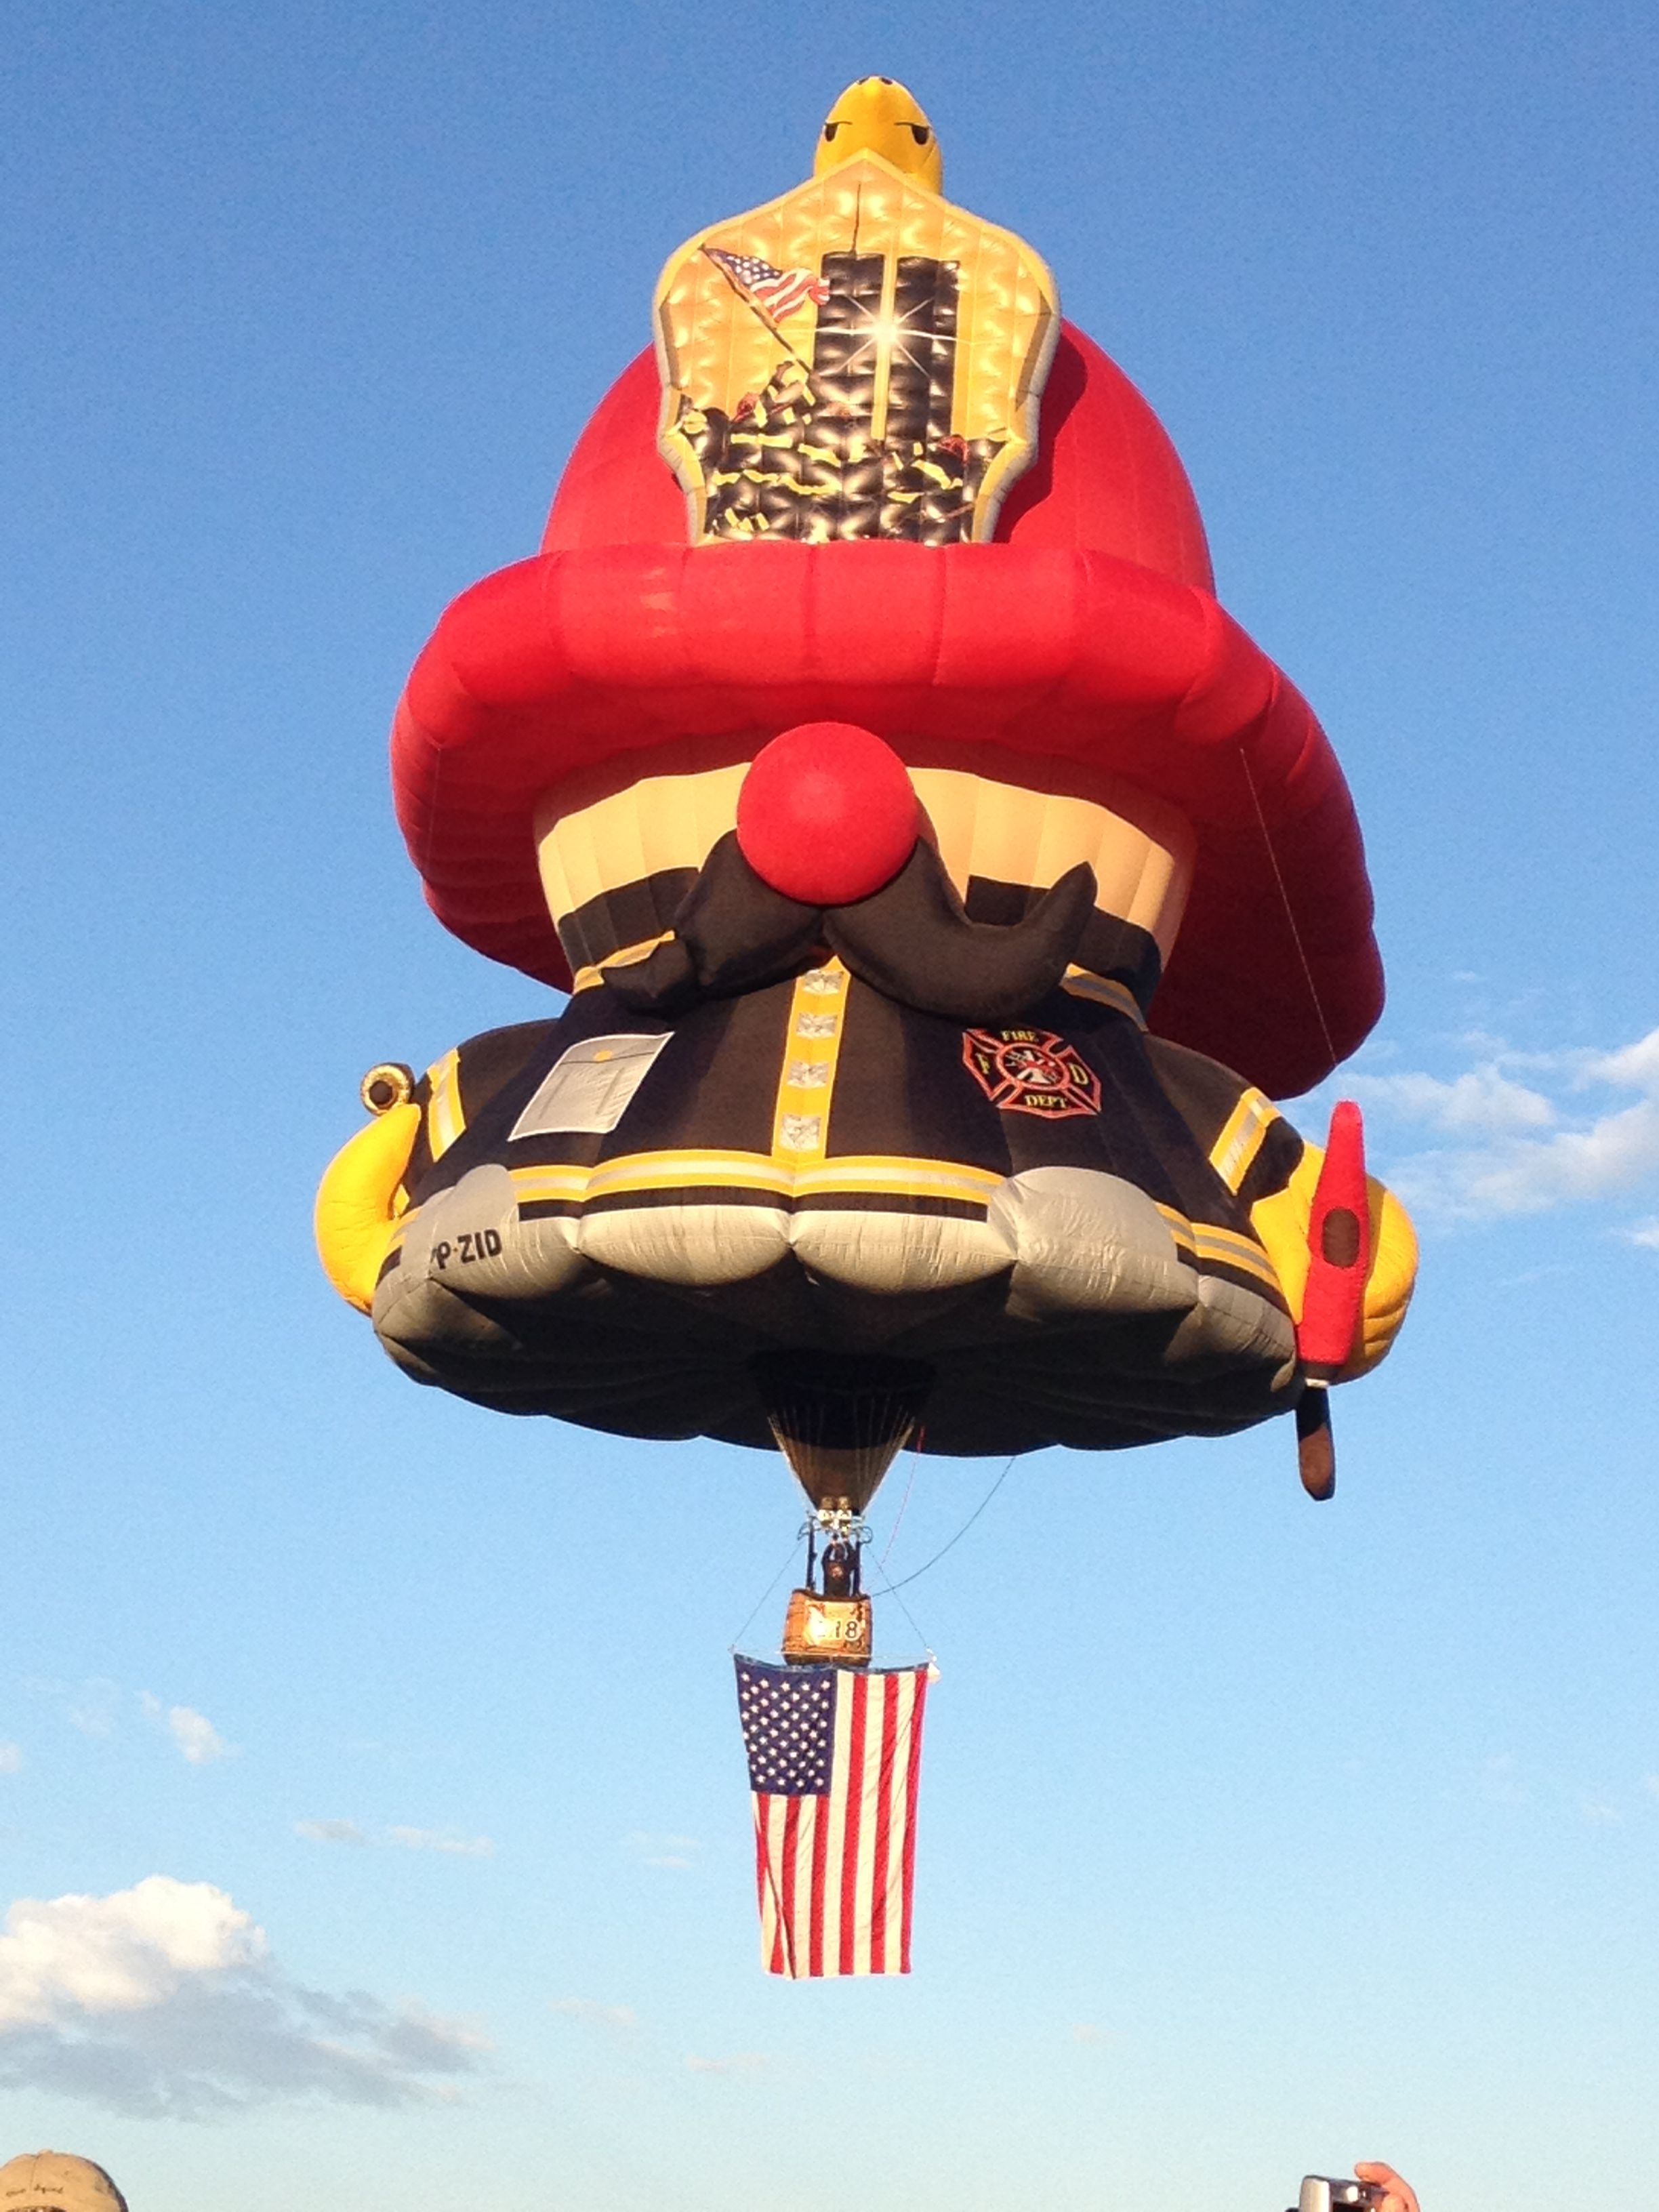 Fireman Balloons, Ballooning, Hot air balloon